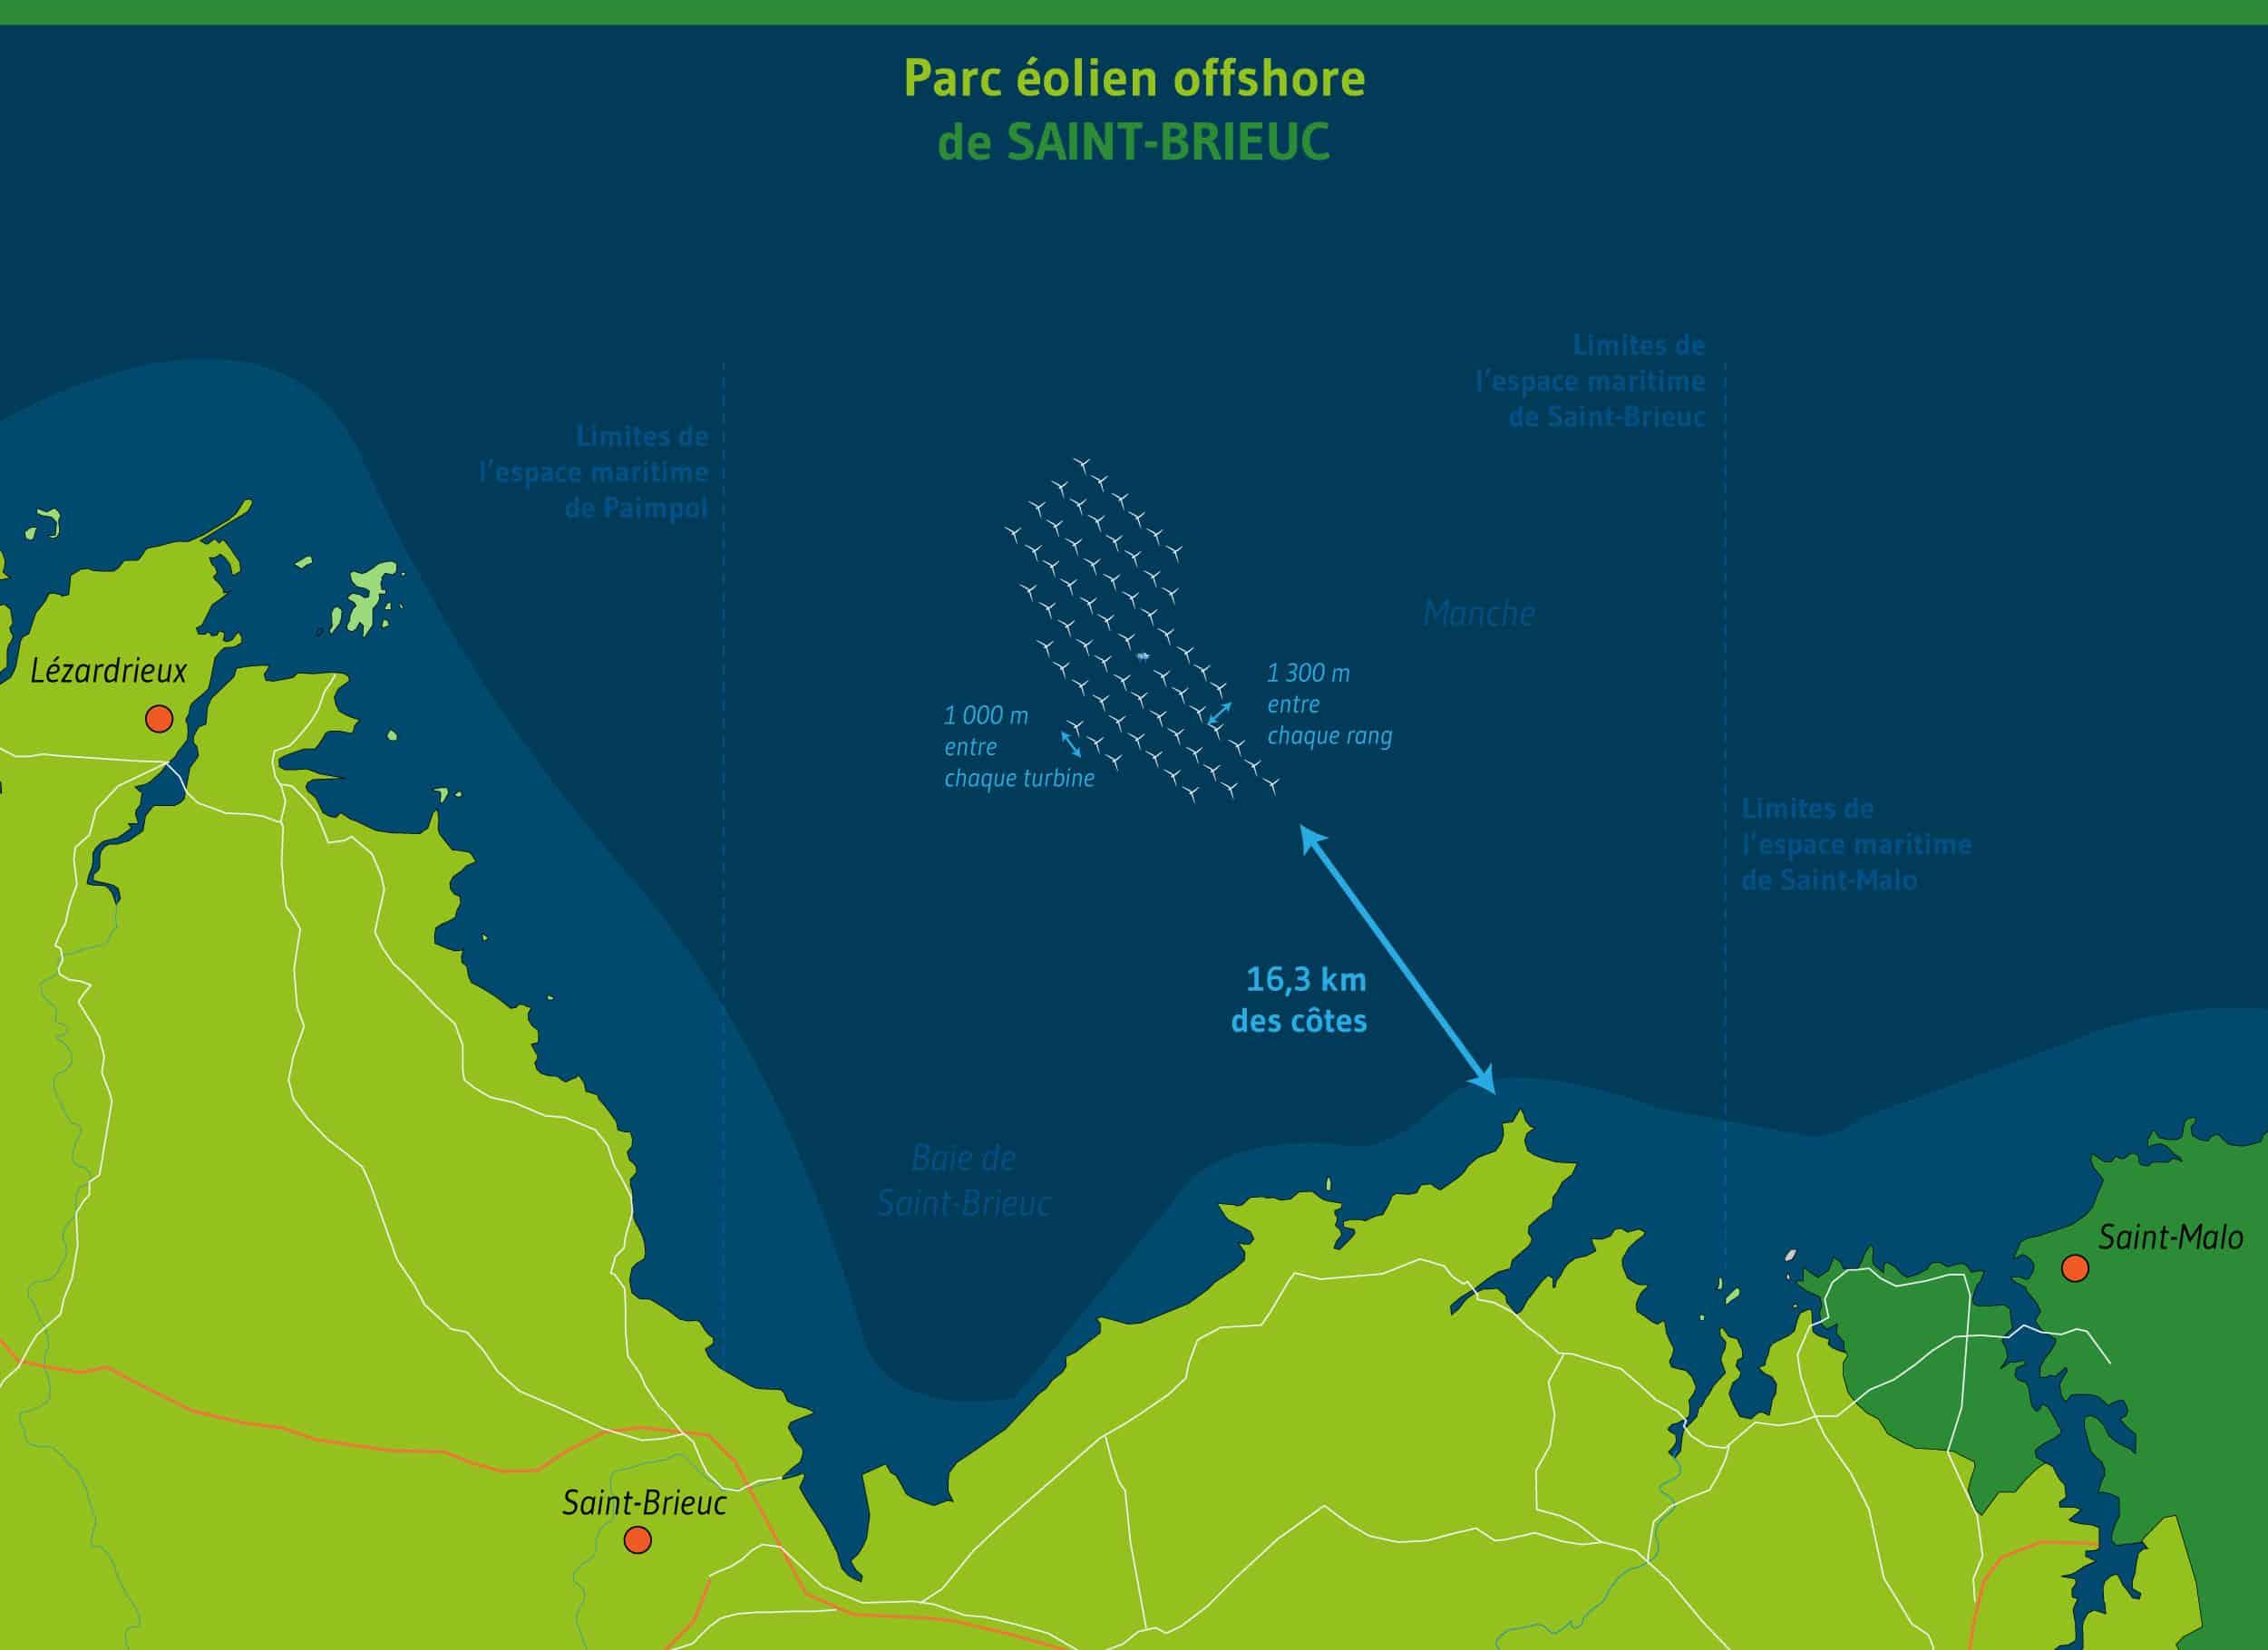 map-off-shore